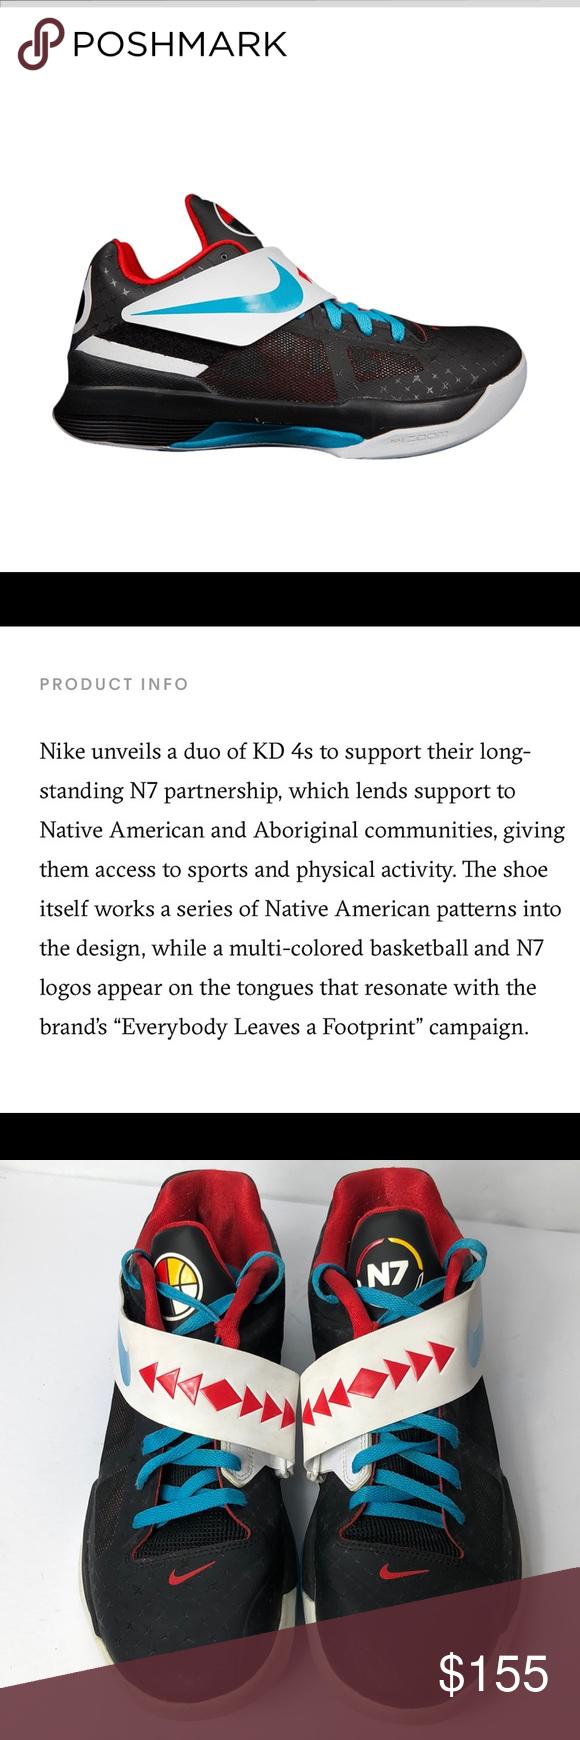 Nike N7 Tinker Hatfield Shoes 2019 Release Date